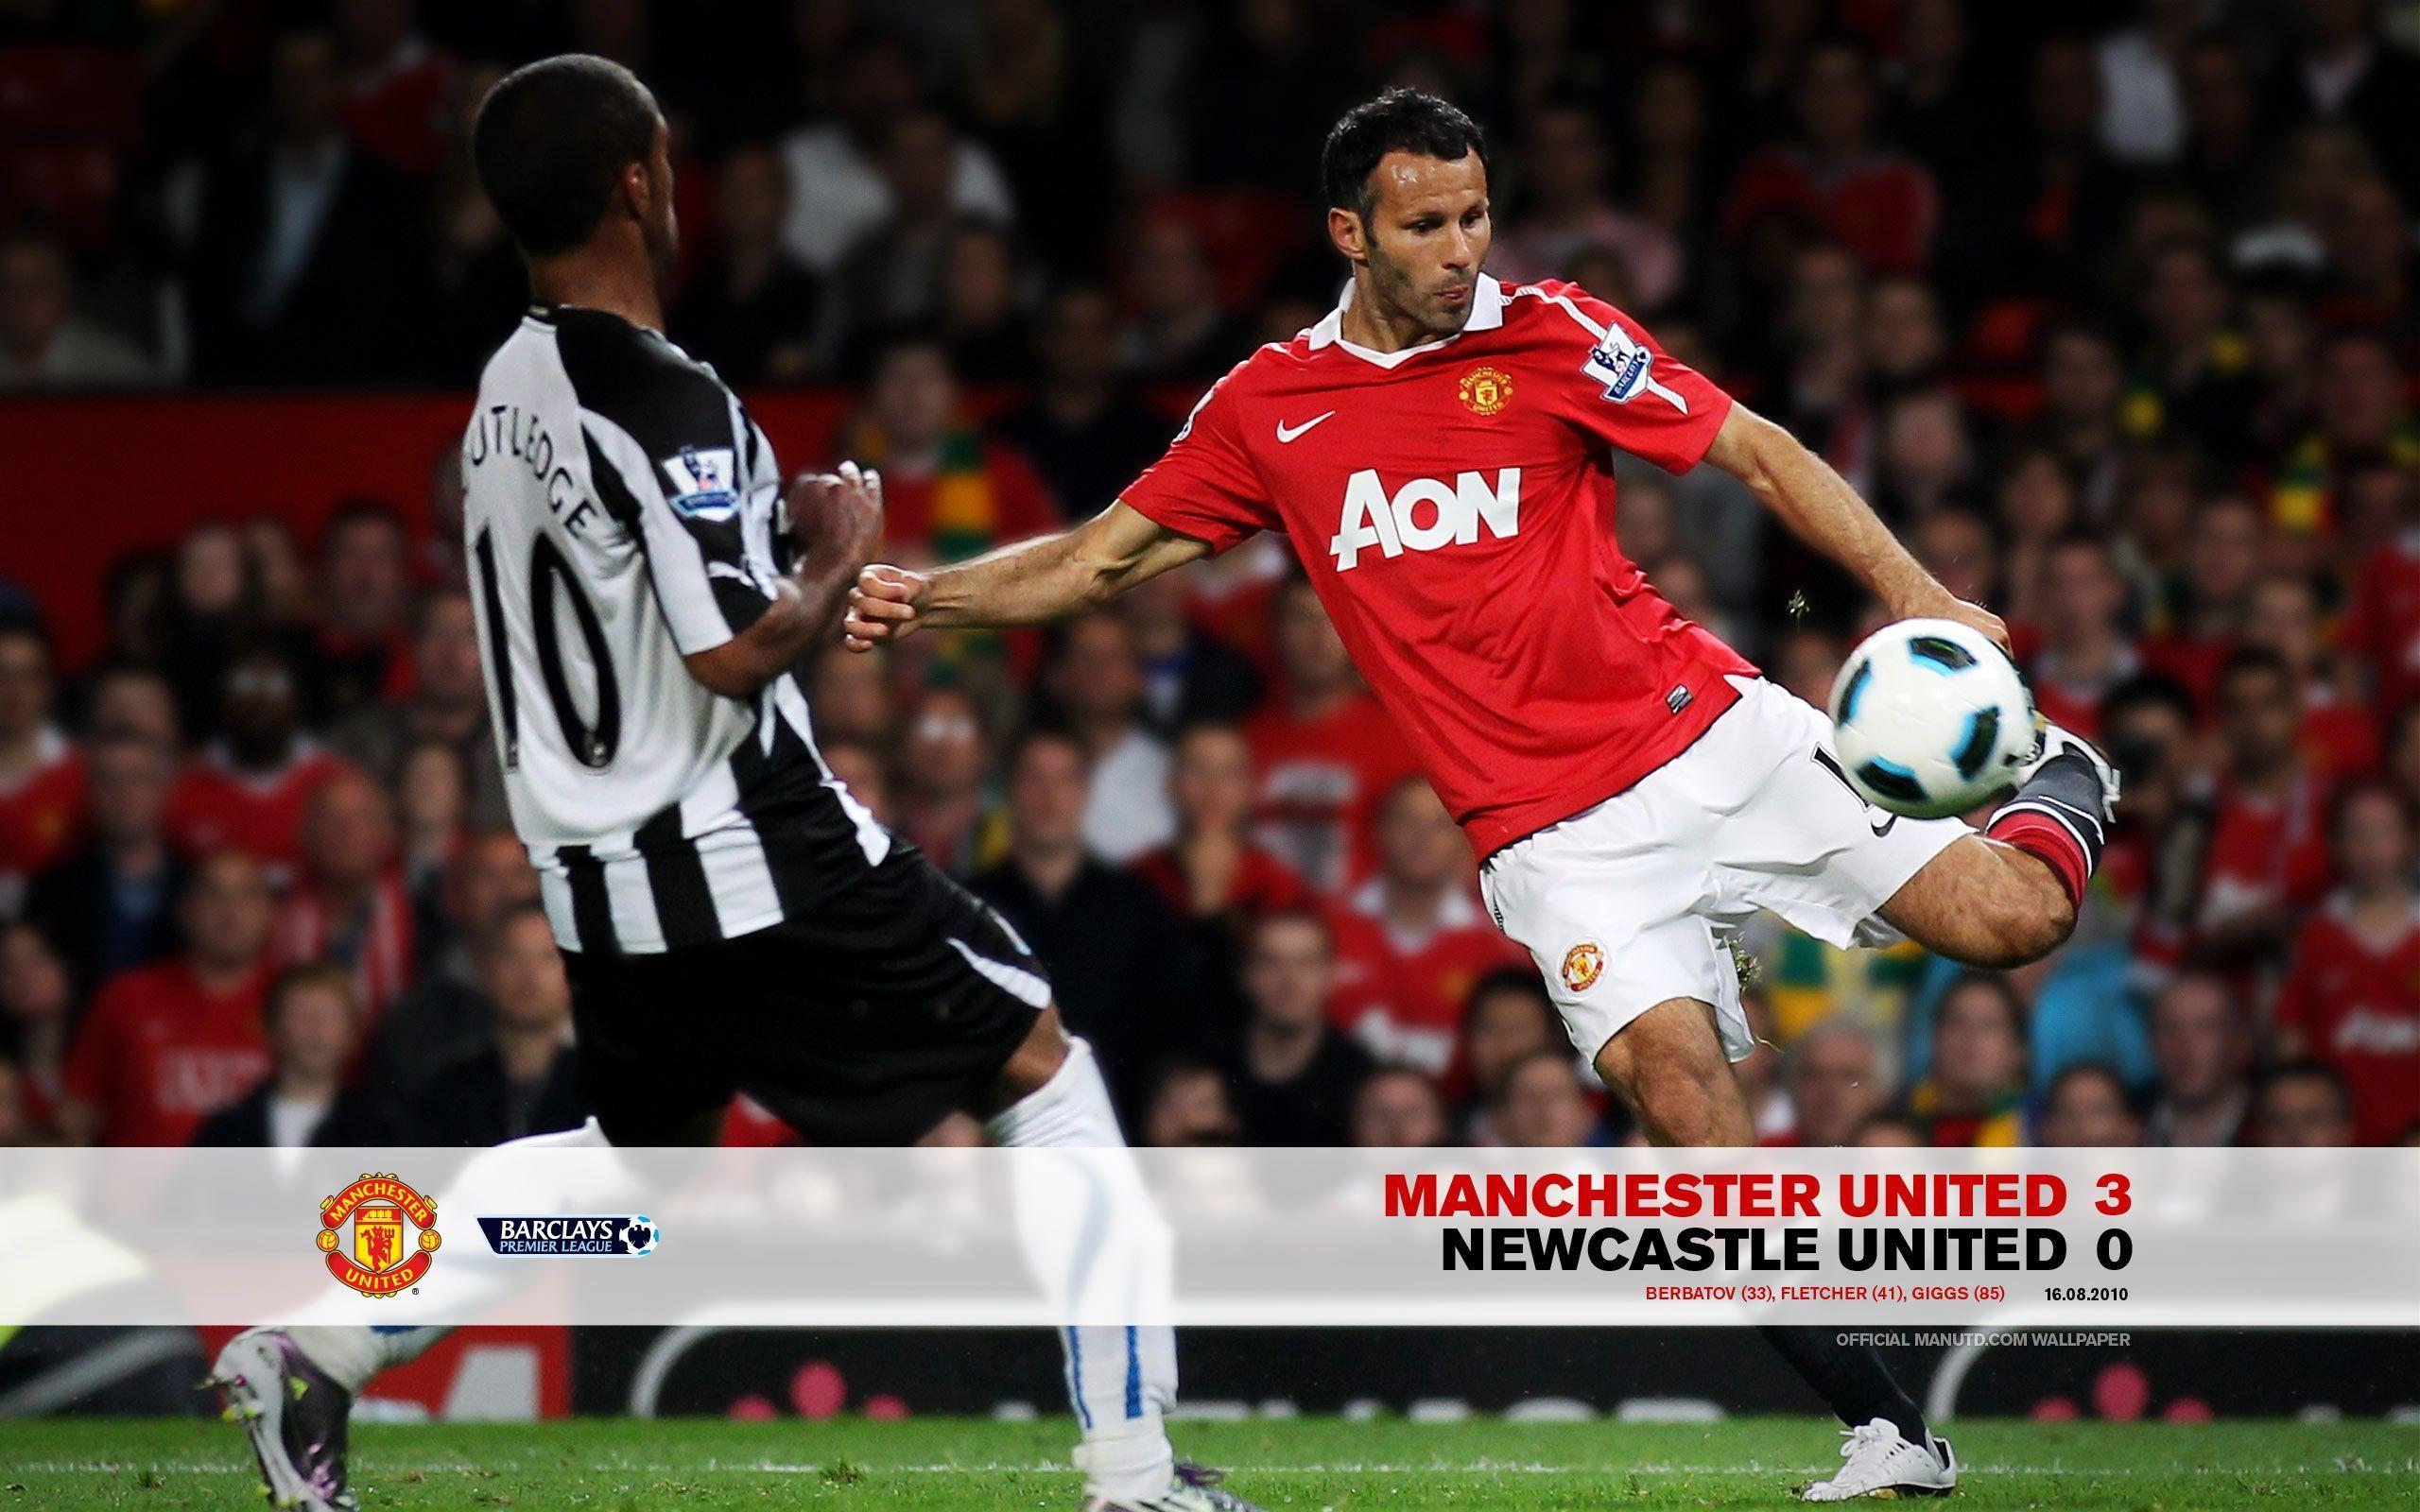 newcastle vs man united - photo #6